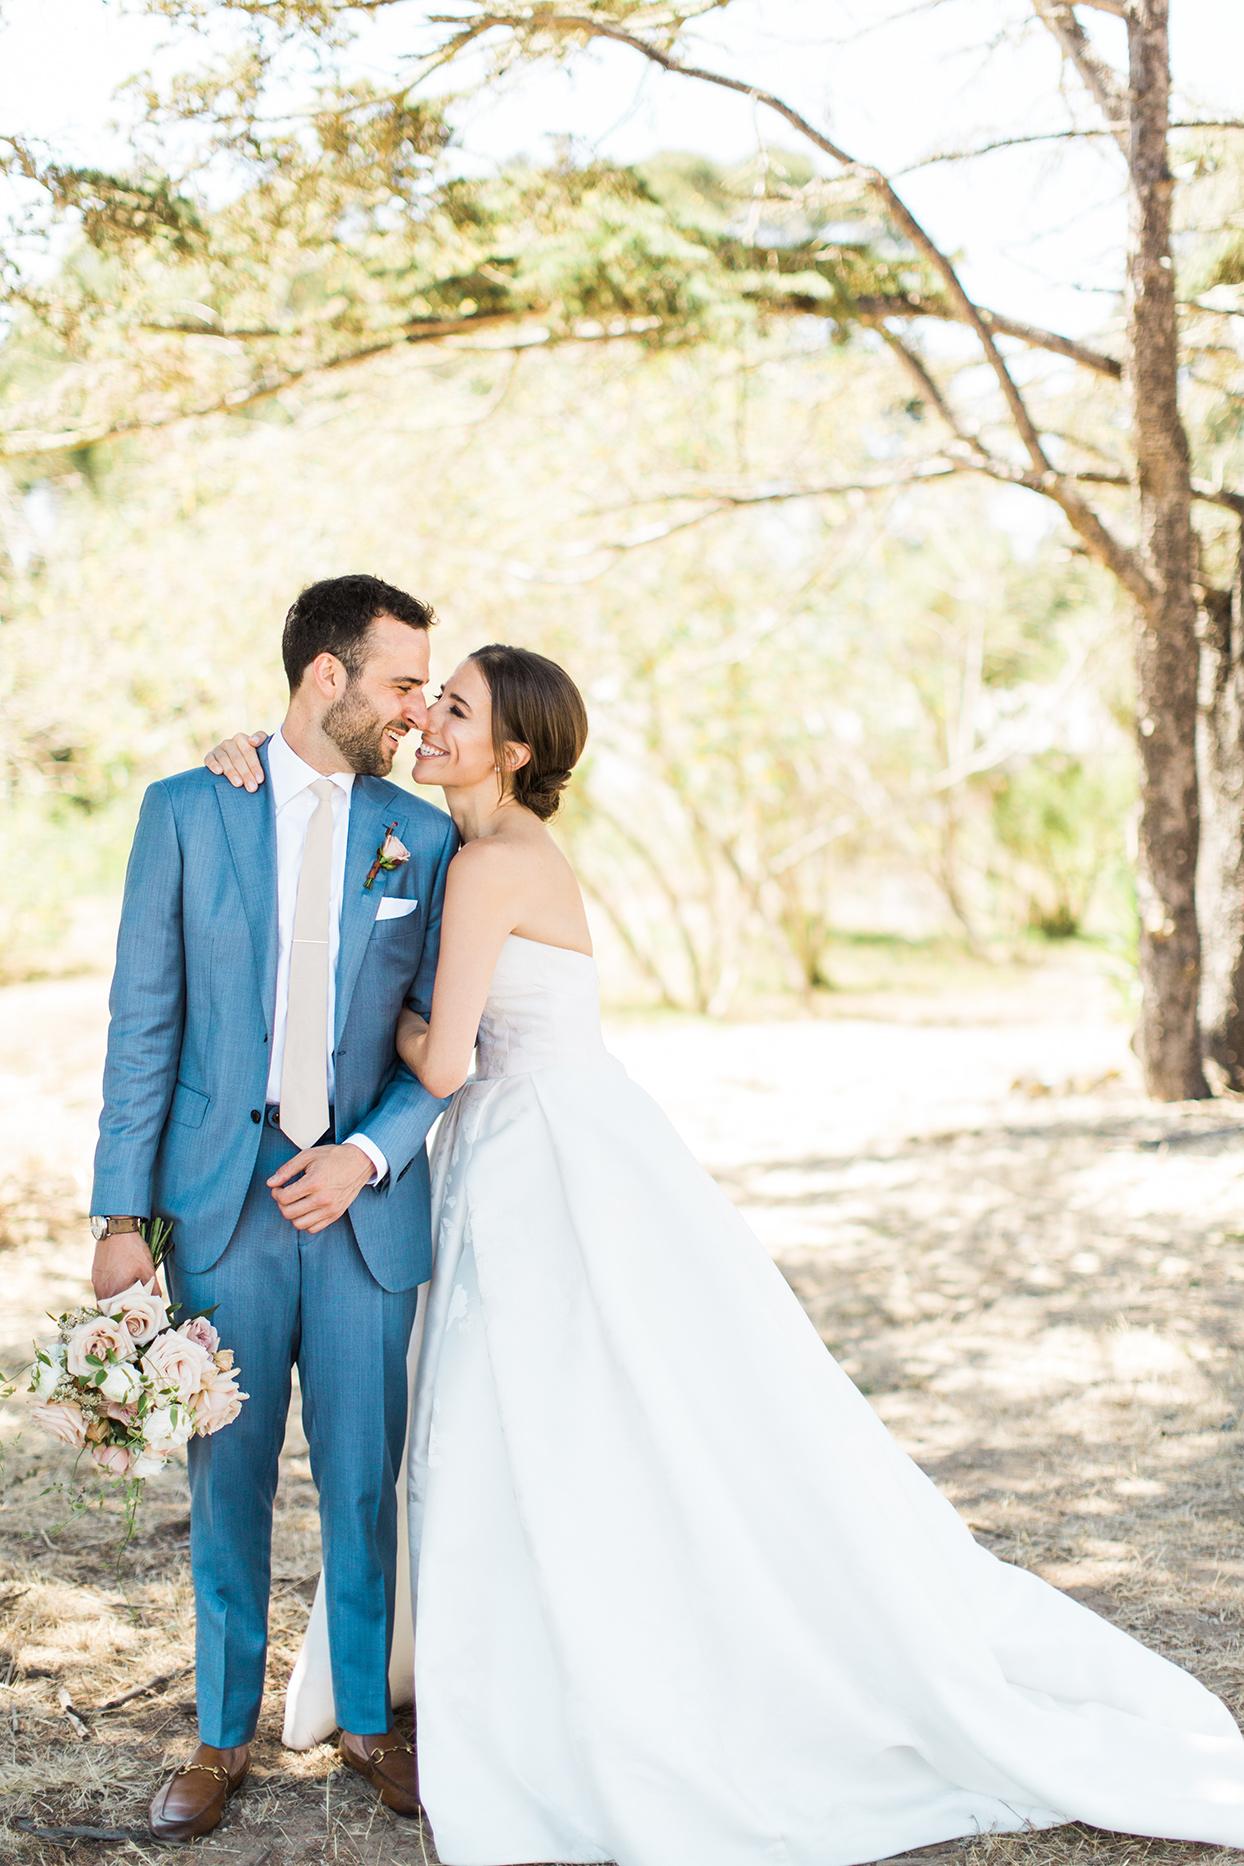 This Greenhouse Wedding Showed Off Coastal Santa Barbara at Its Very Best